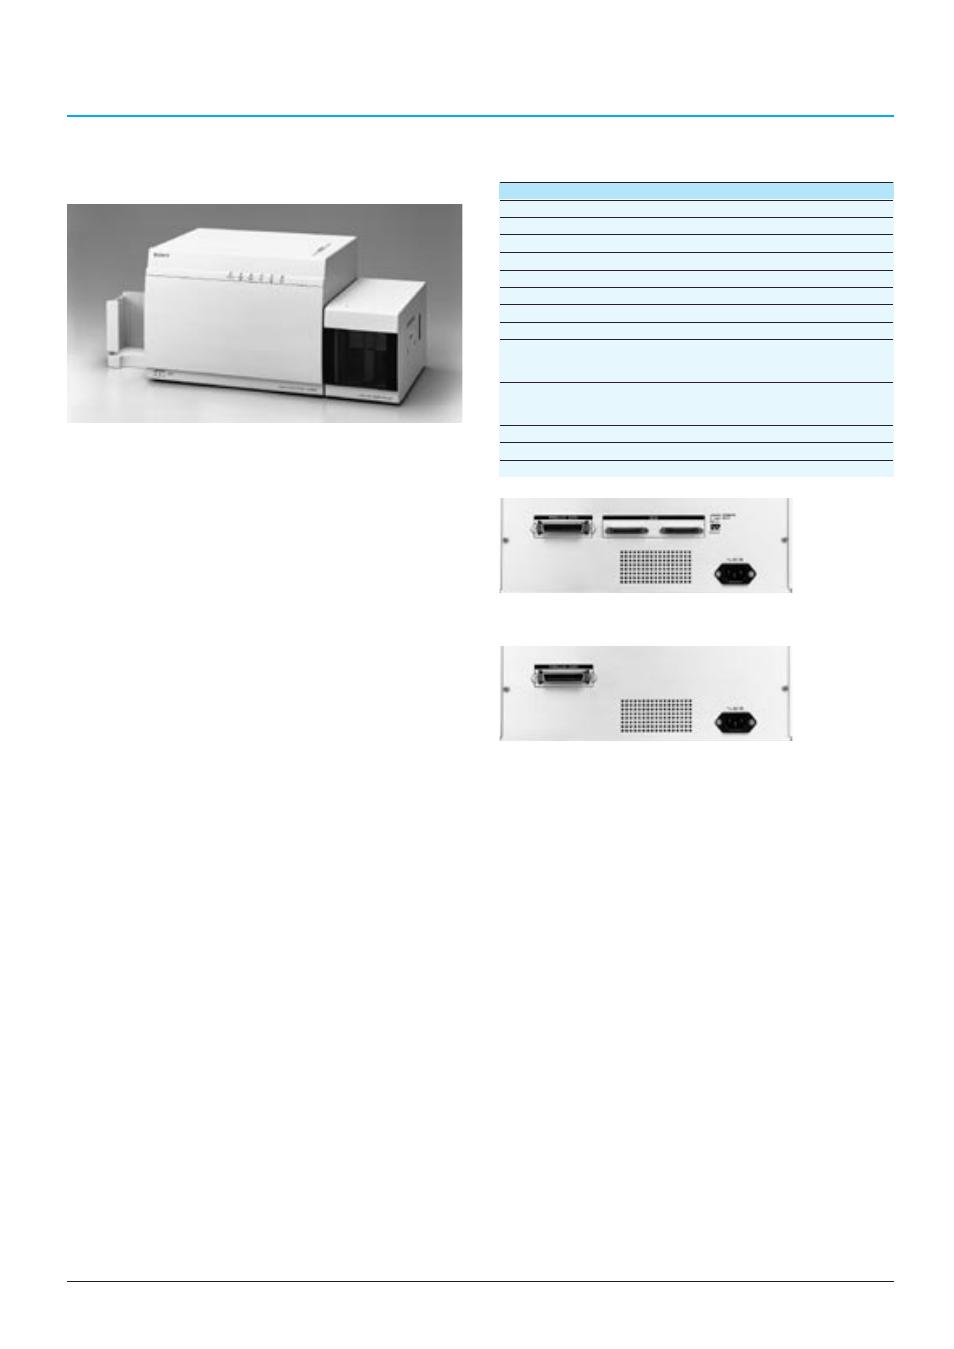 digital colour printer supplied accessories optional accessories rh manualsdir com Sony DAV HDX576WF Manual Sony Operating Manuals ICD-UX523